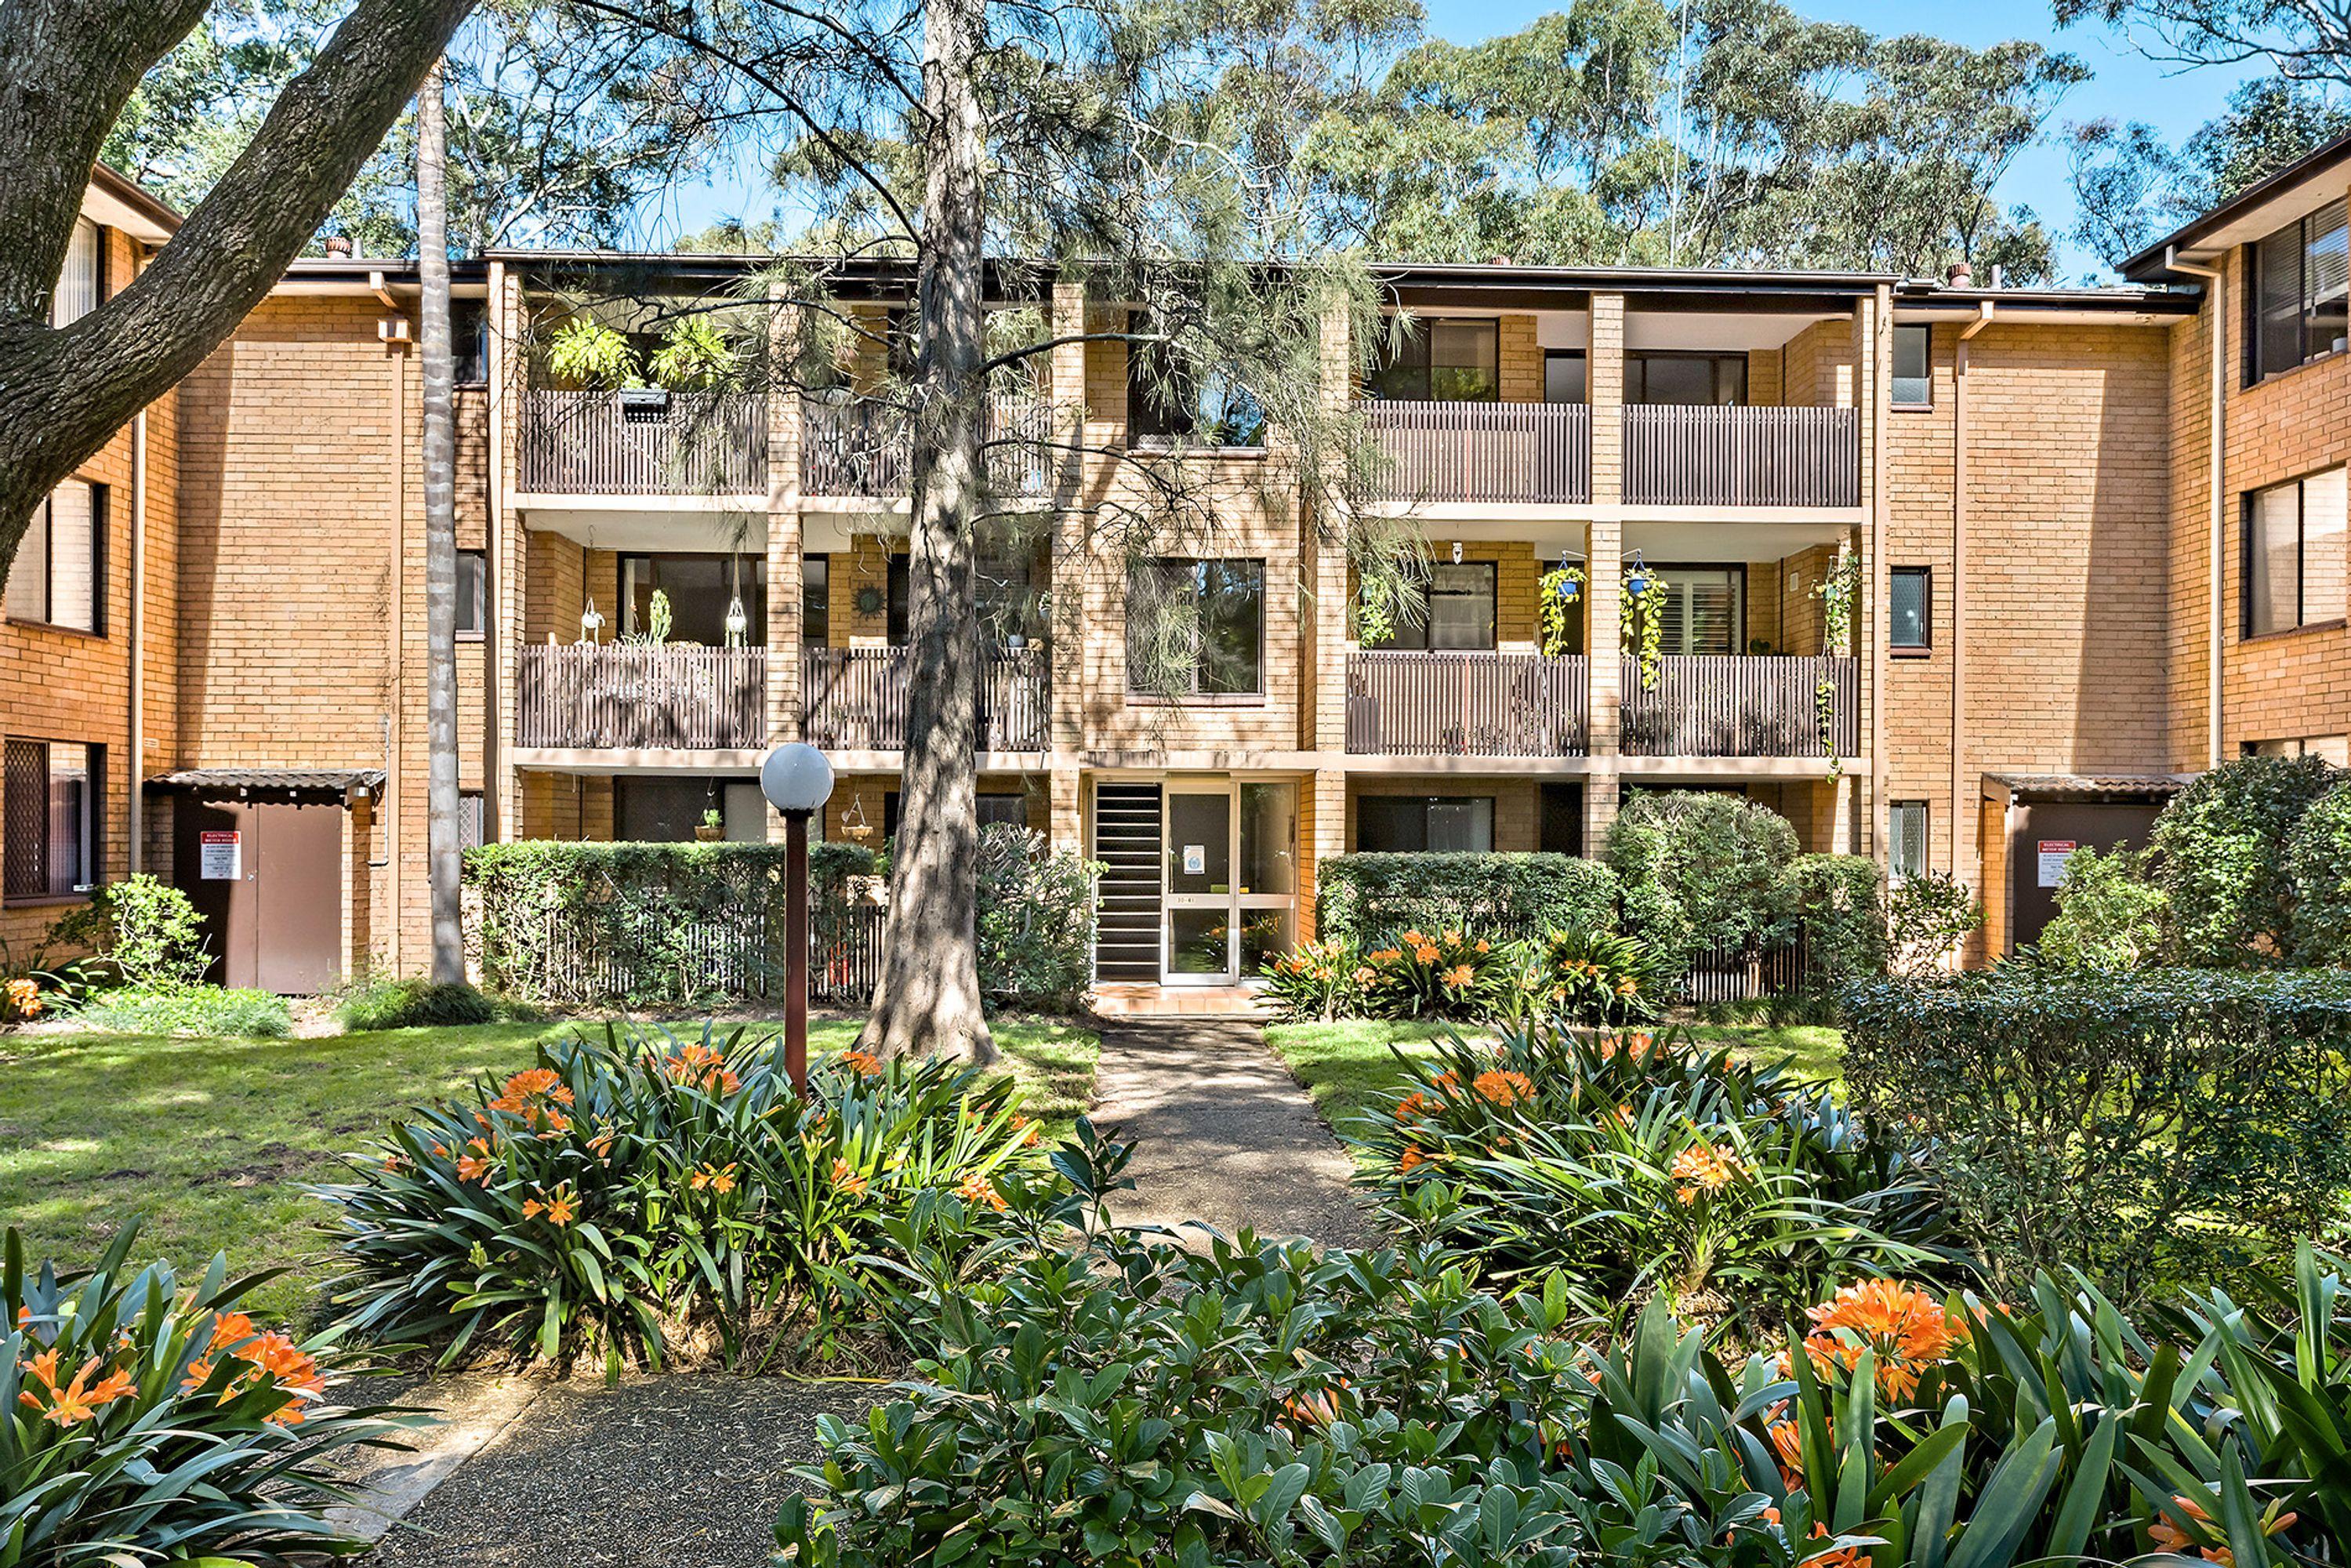 35/35-39 Fontenoy Road, Macquarie Park, NSW 2113